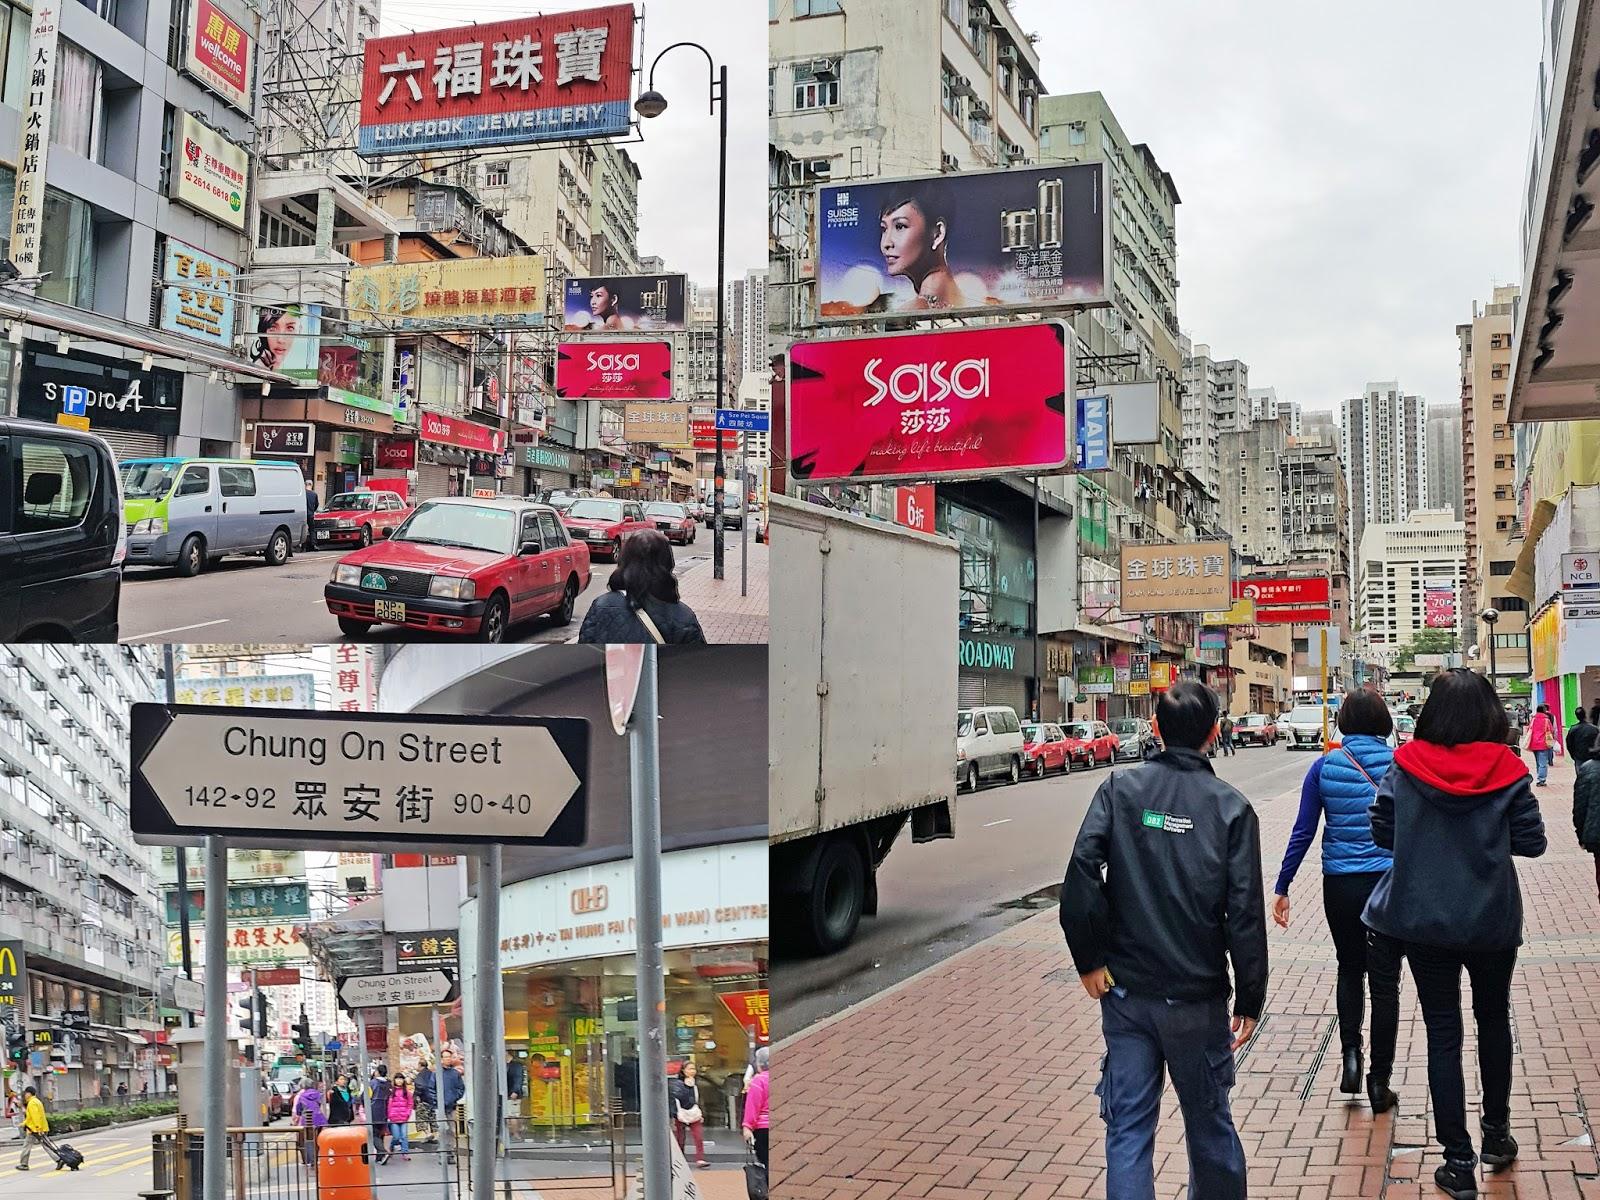 Trip To Hong Kong 香港 Panda Hotel 悦来酒店 Just An Ordinary Girl